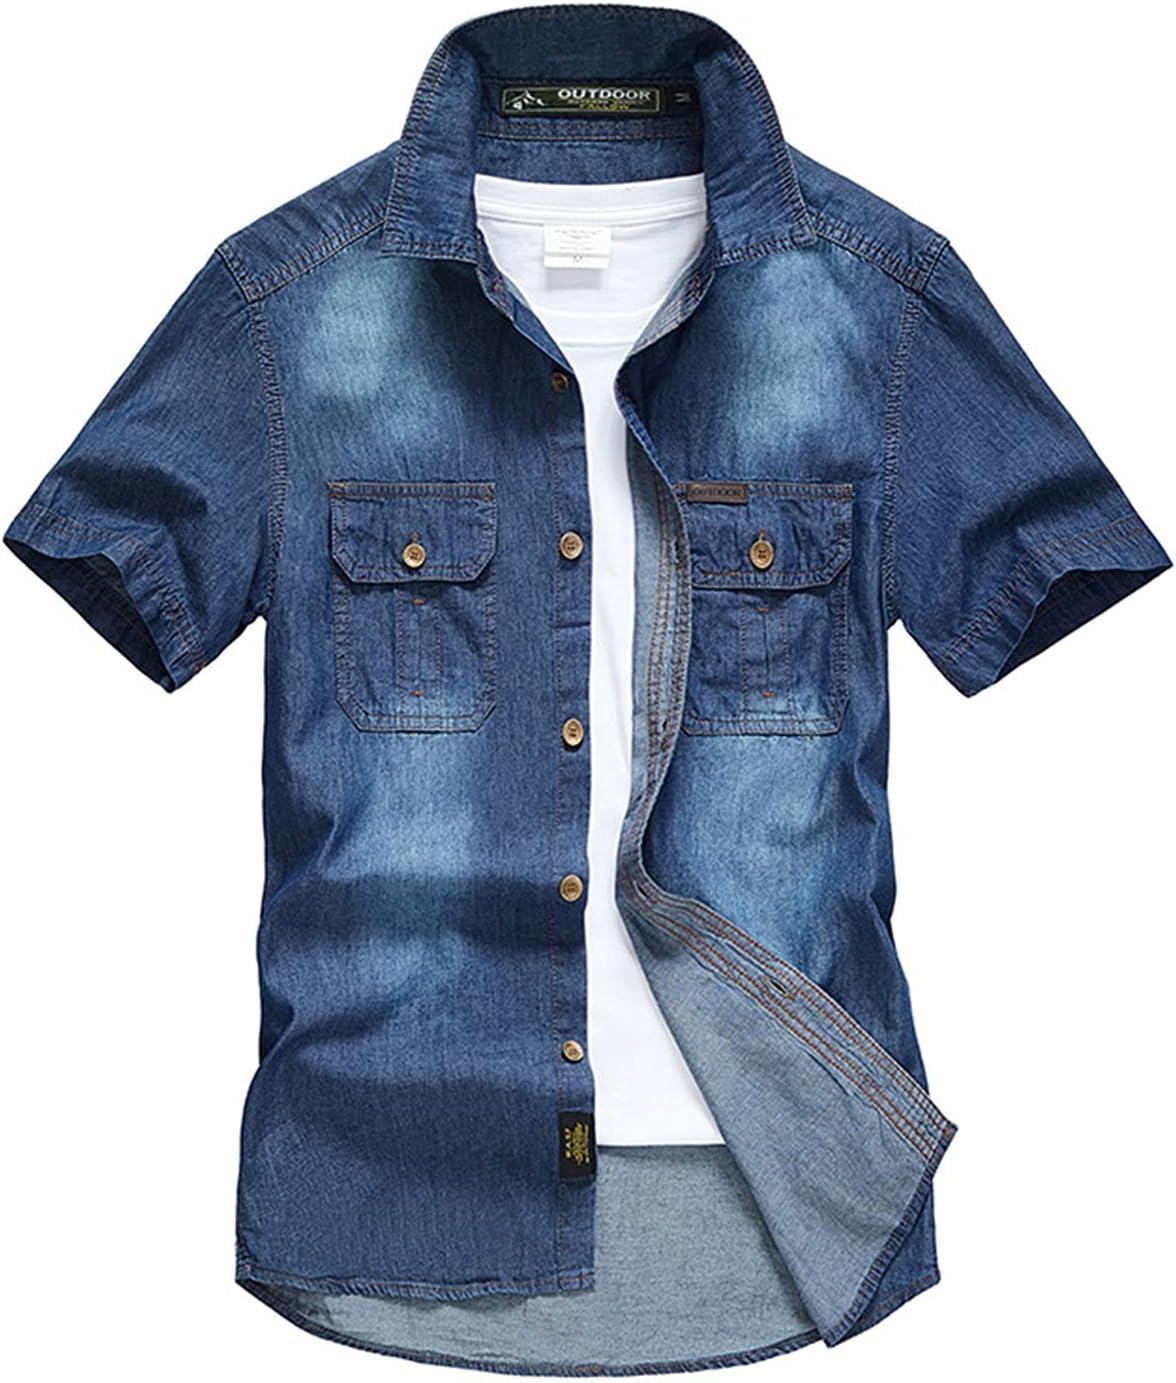 Men's Summer Product Casual Japan Maker New Button Down Shirts Denim Slim S Standard-Fit